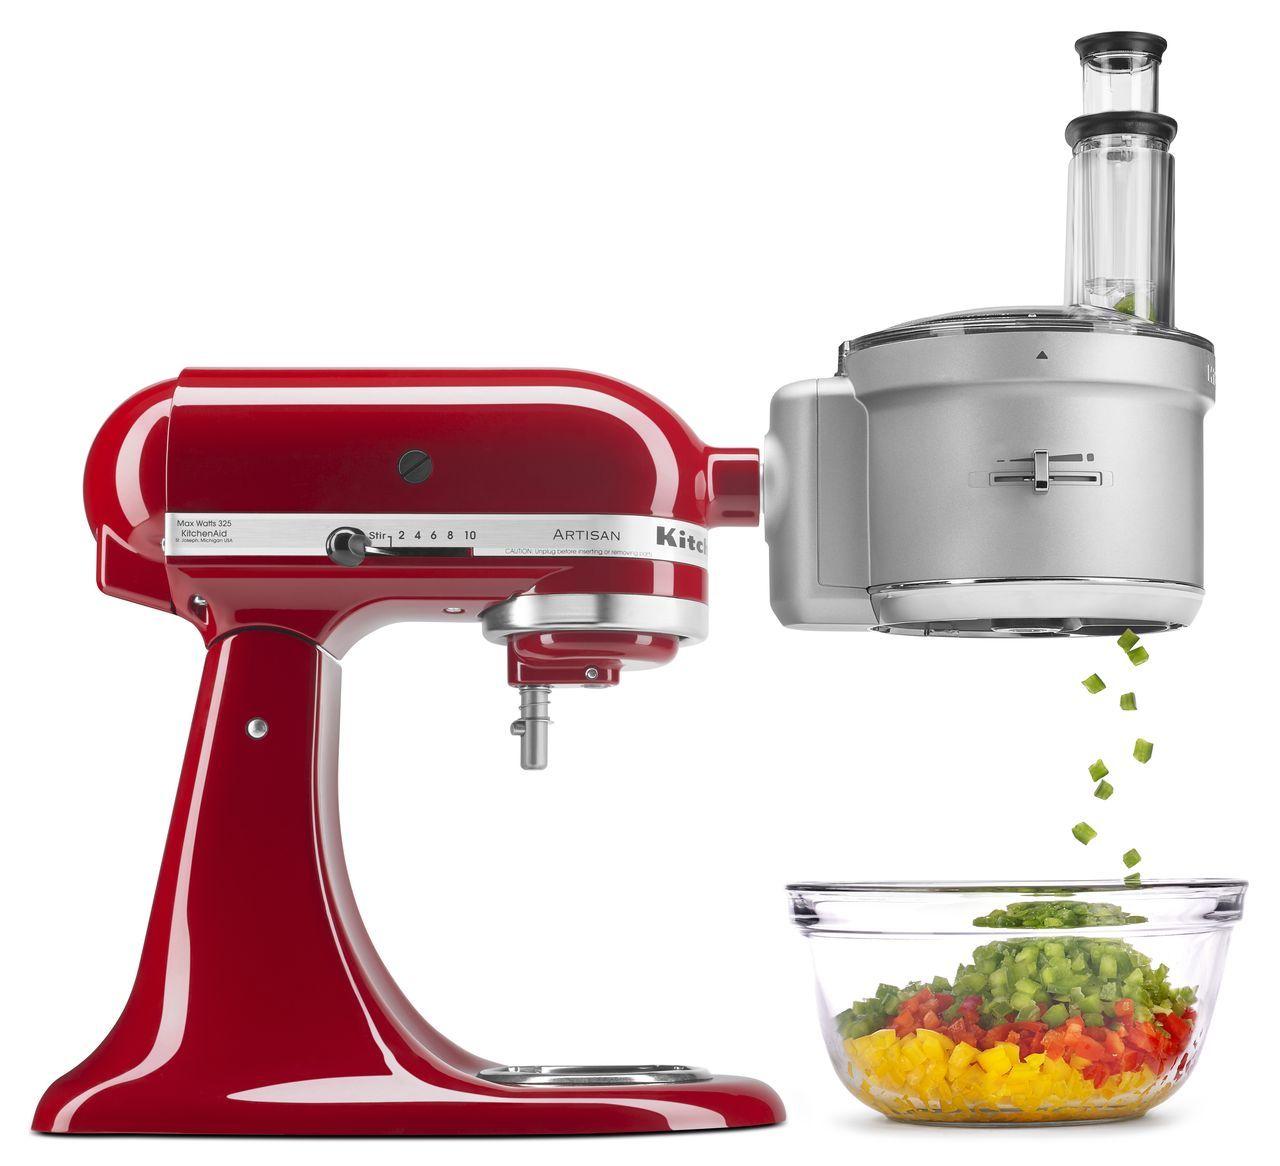 Home Kitchenaid Food Processor Food Processor Recipes